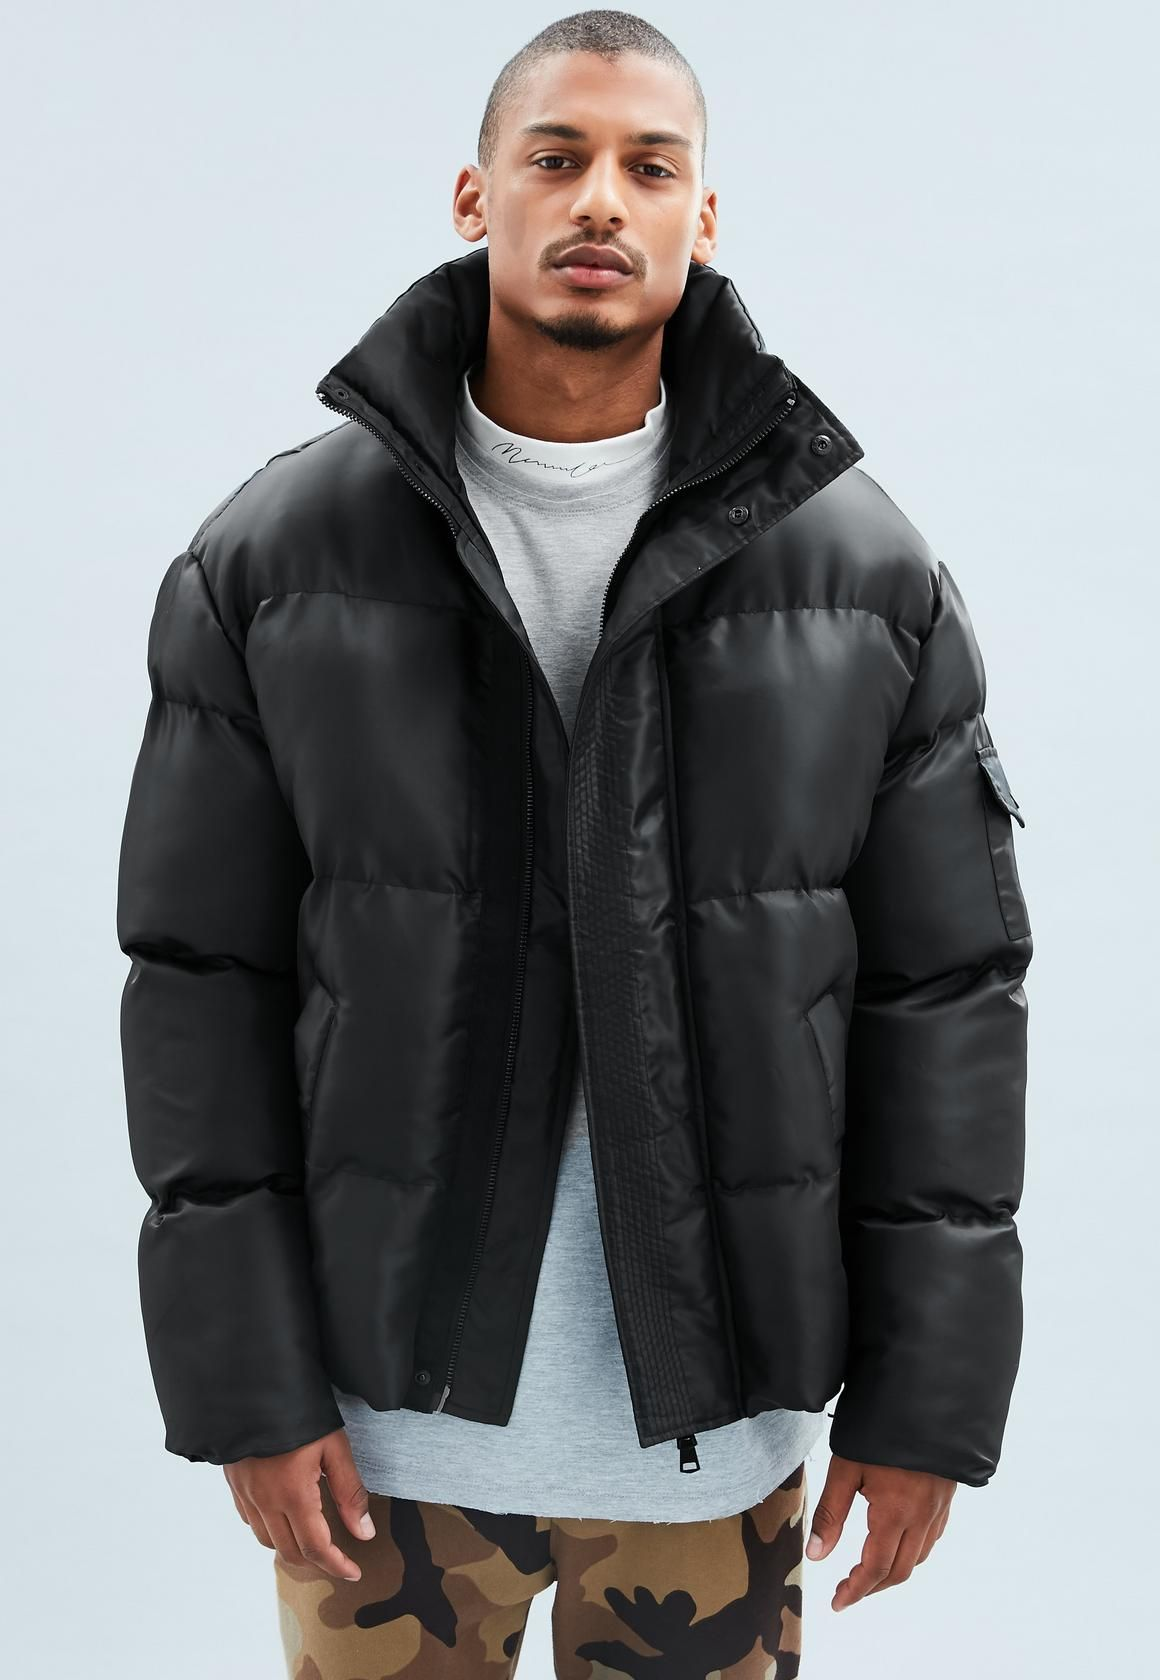 fce7ebe170d4 Mennace - Black Puffer Jacket. Mennace - Black Puffer Jacket Men s ...